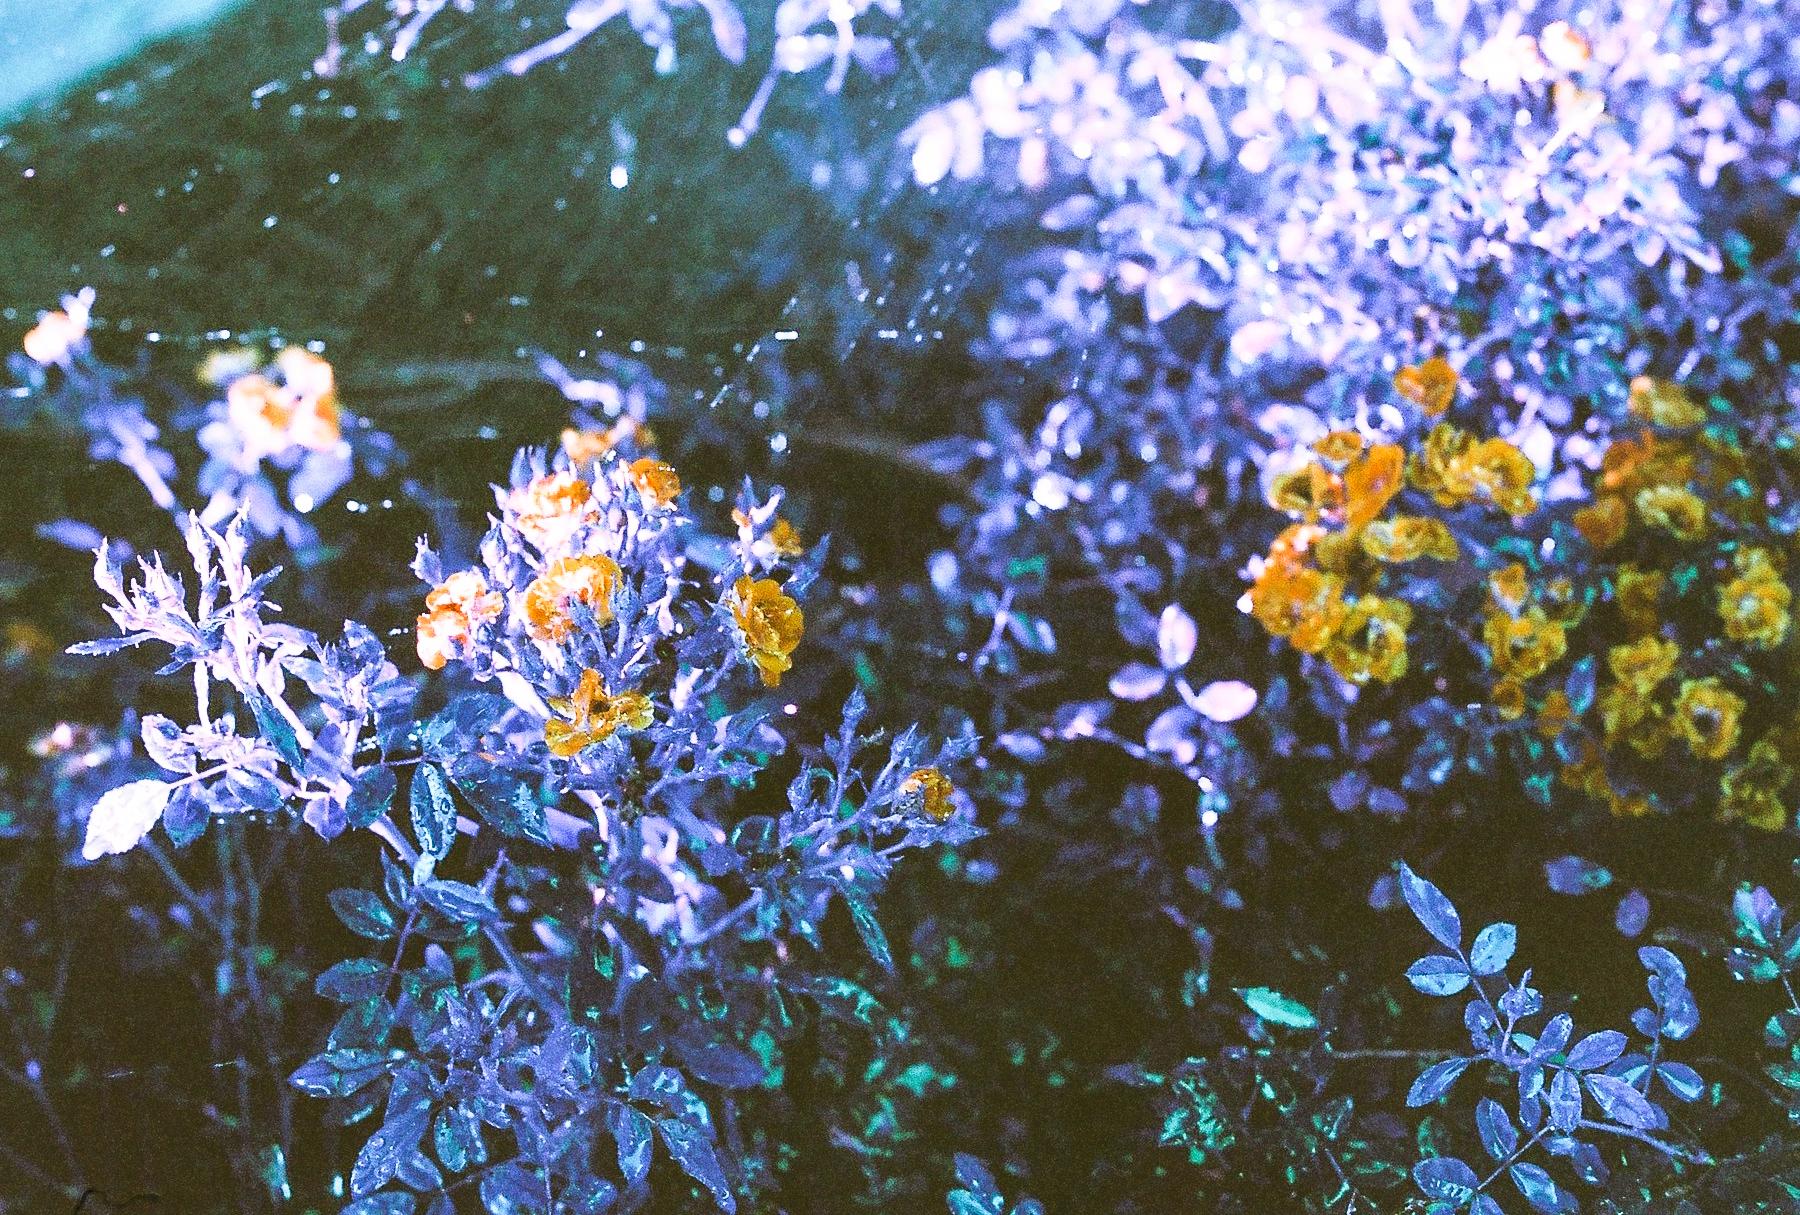 Watered flowers. (C) Paige Jarreau